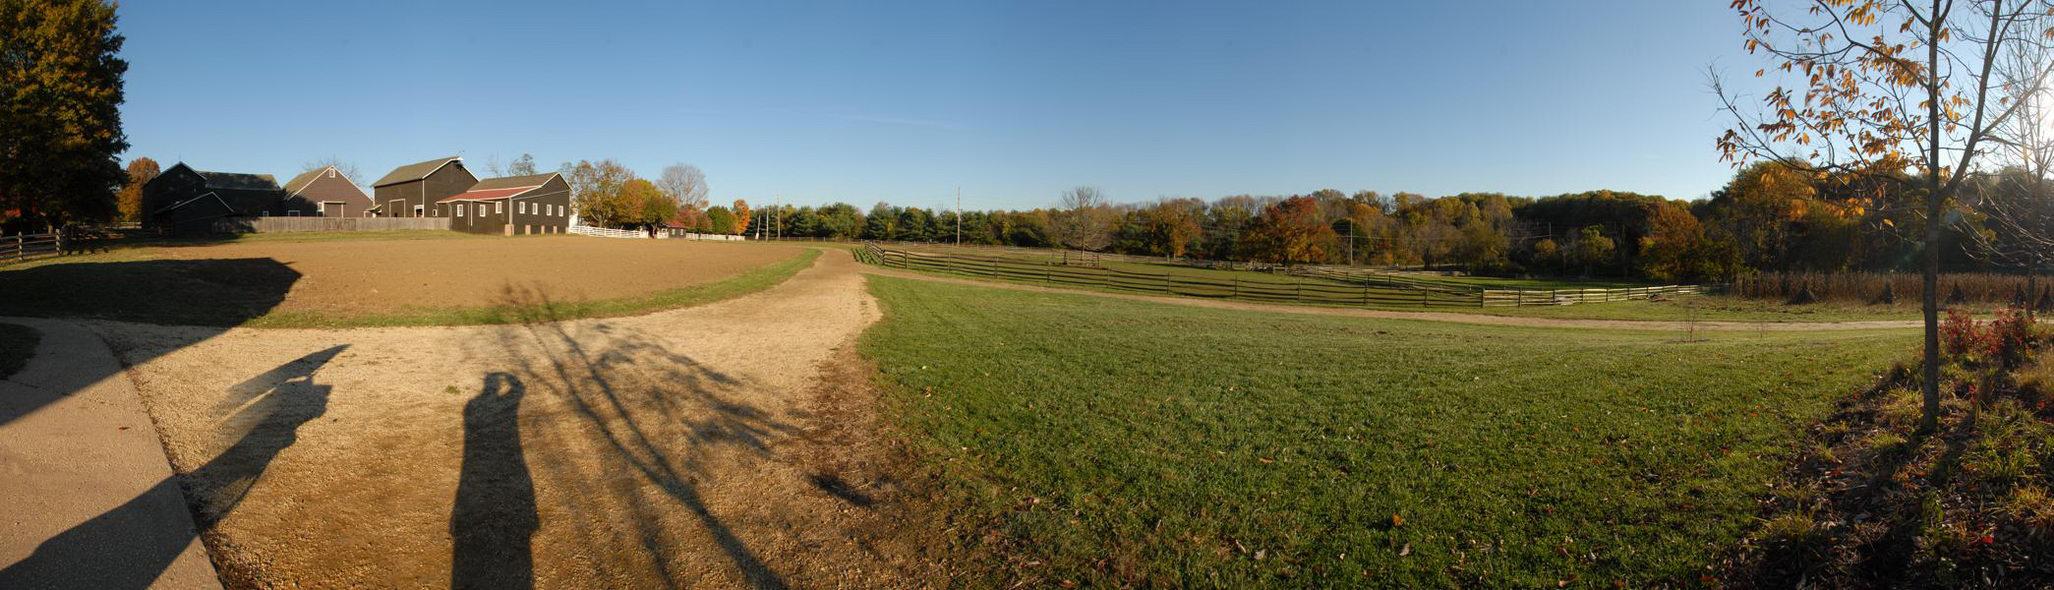 blue sky, field, grass, open areas, trees